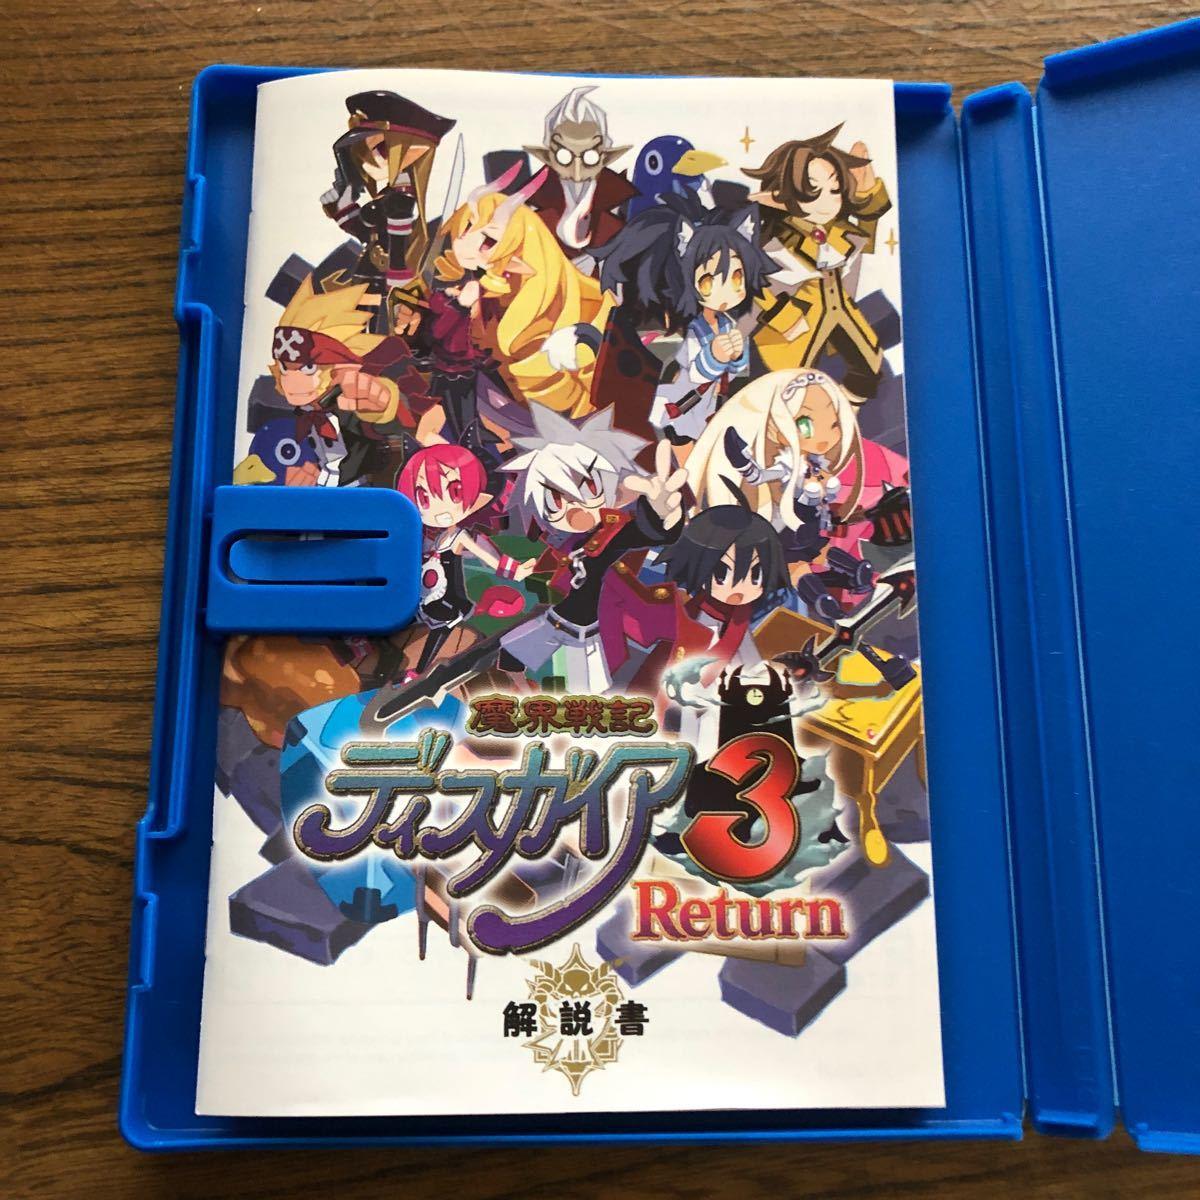 PS Vita 魔界戦記ディスガイア3 Return